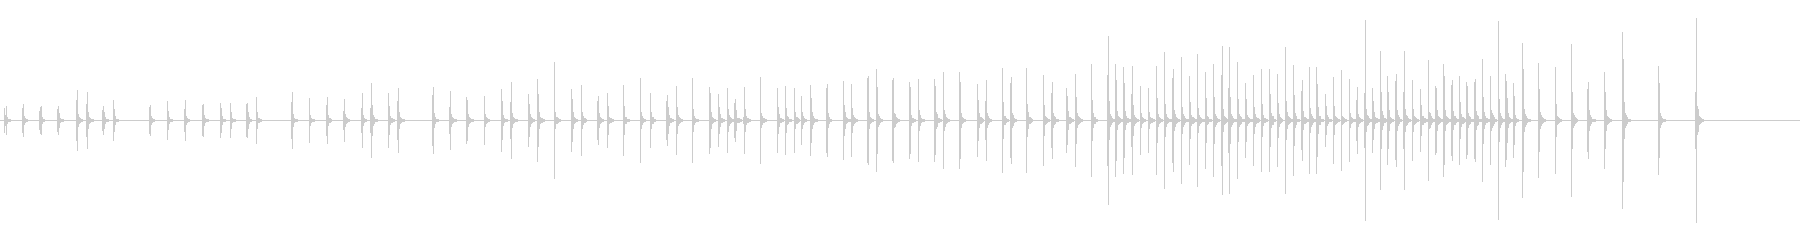 木琴13歌舞伎黒御簾下座音楽和風日本マリの未再生の波形